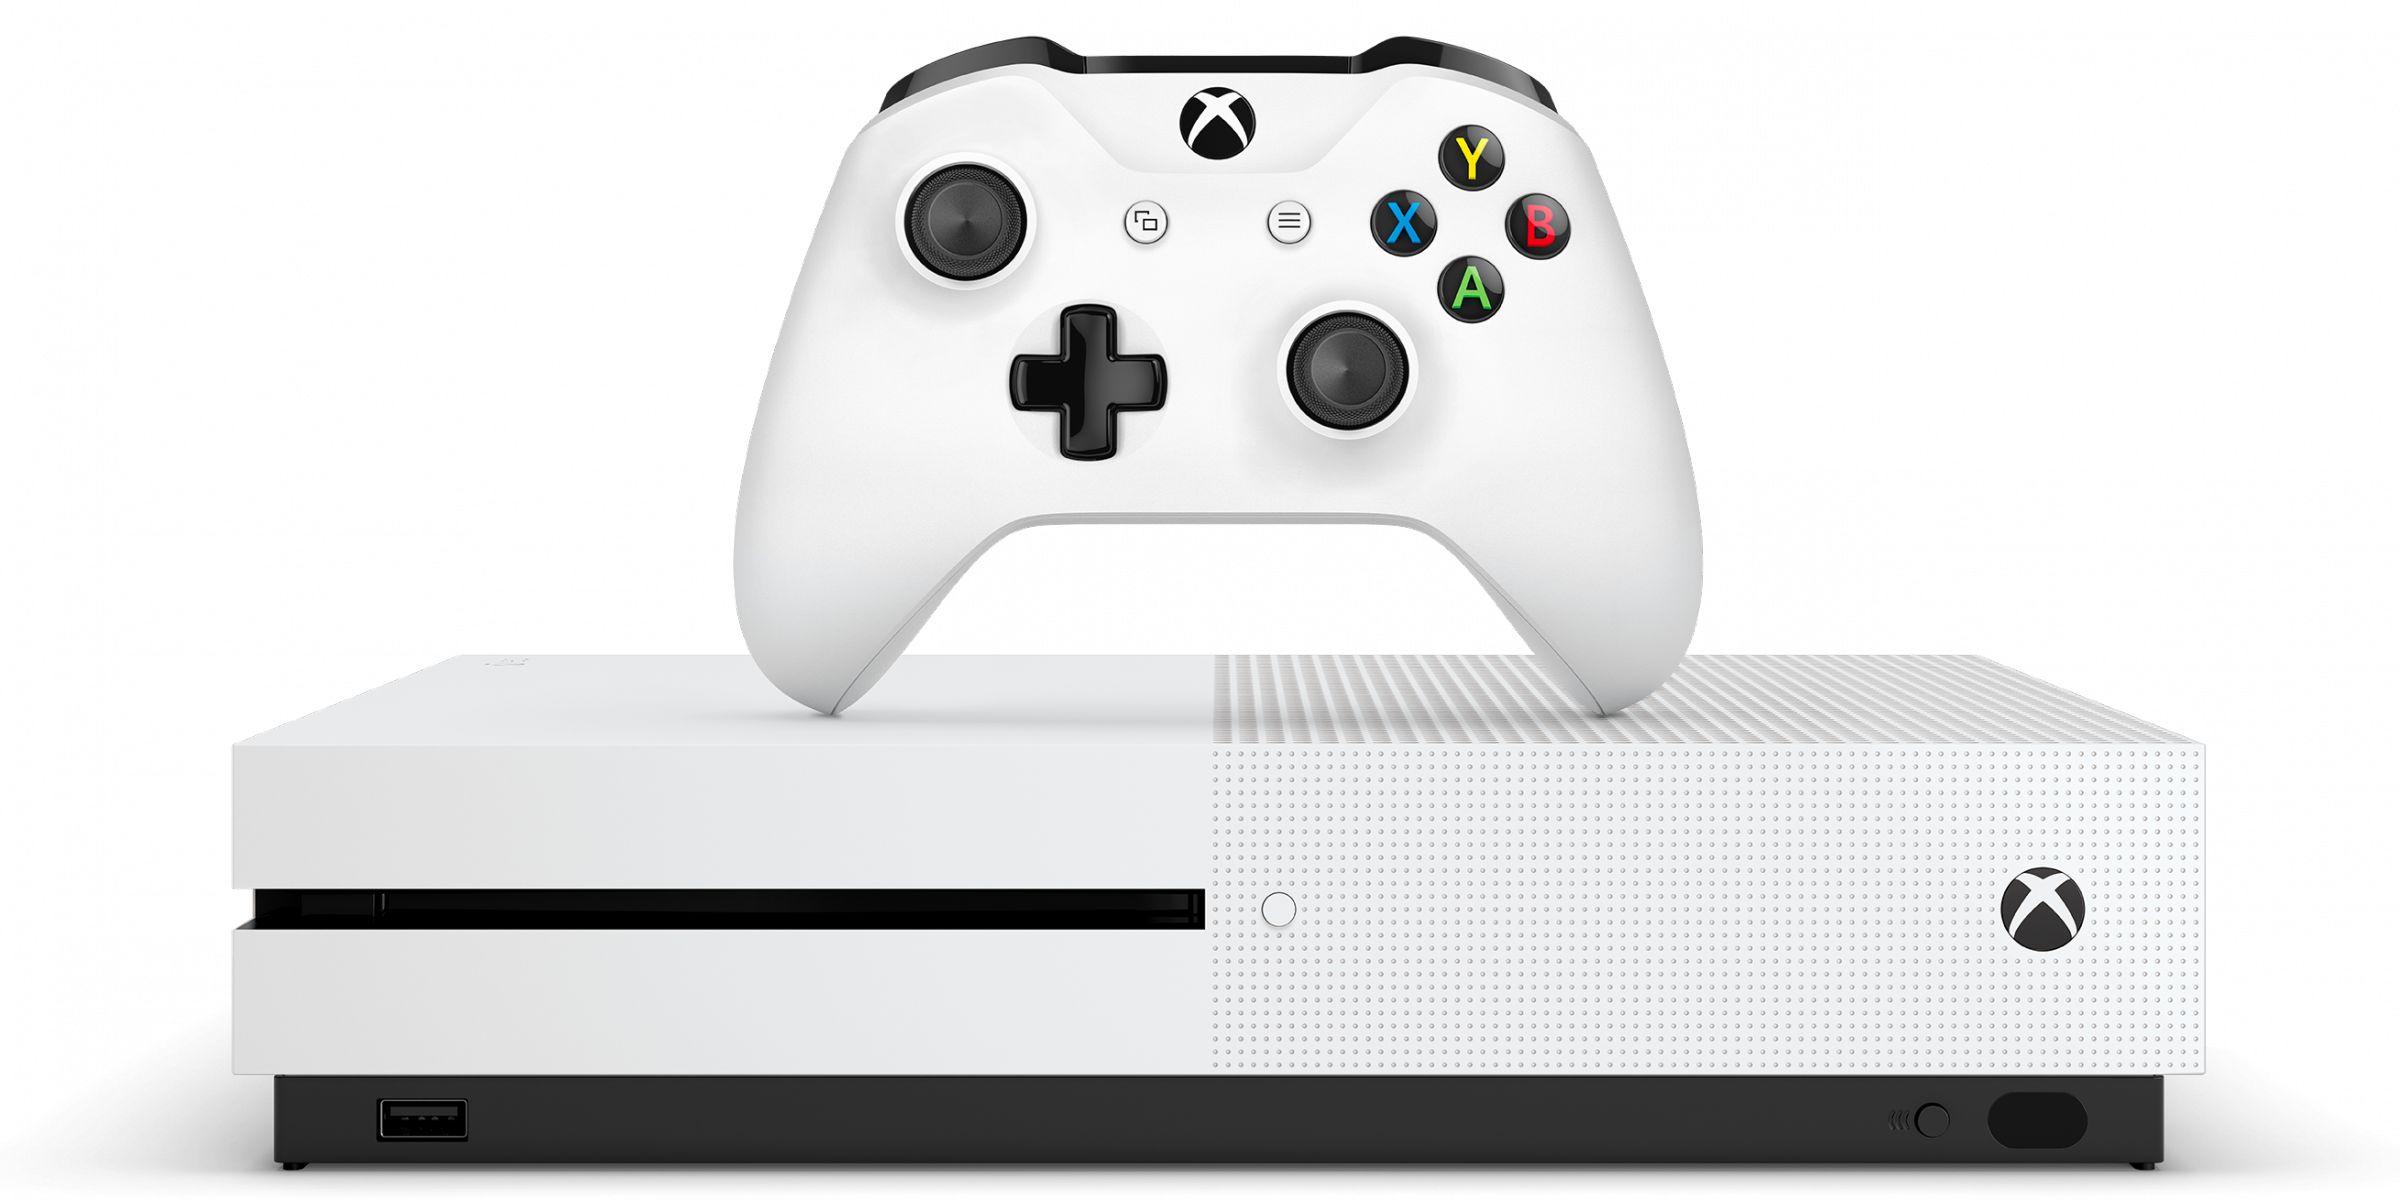 Nye Xbox One S får markedets rimeligste UHD Blu-Ray-spiller med støtte for HDR.